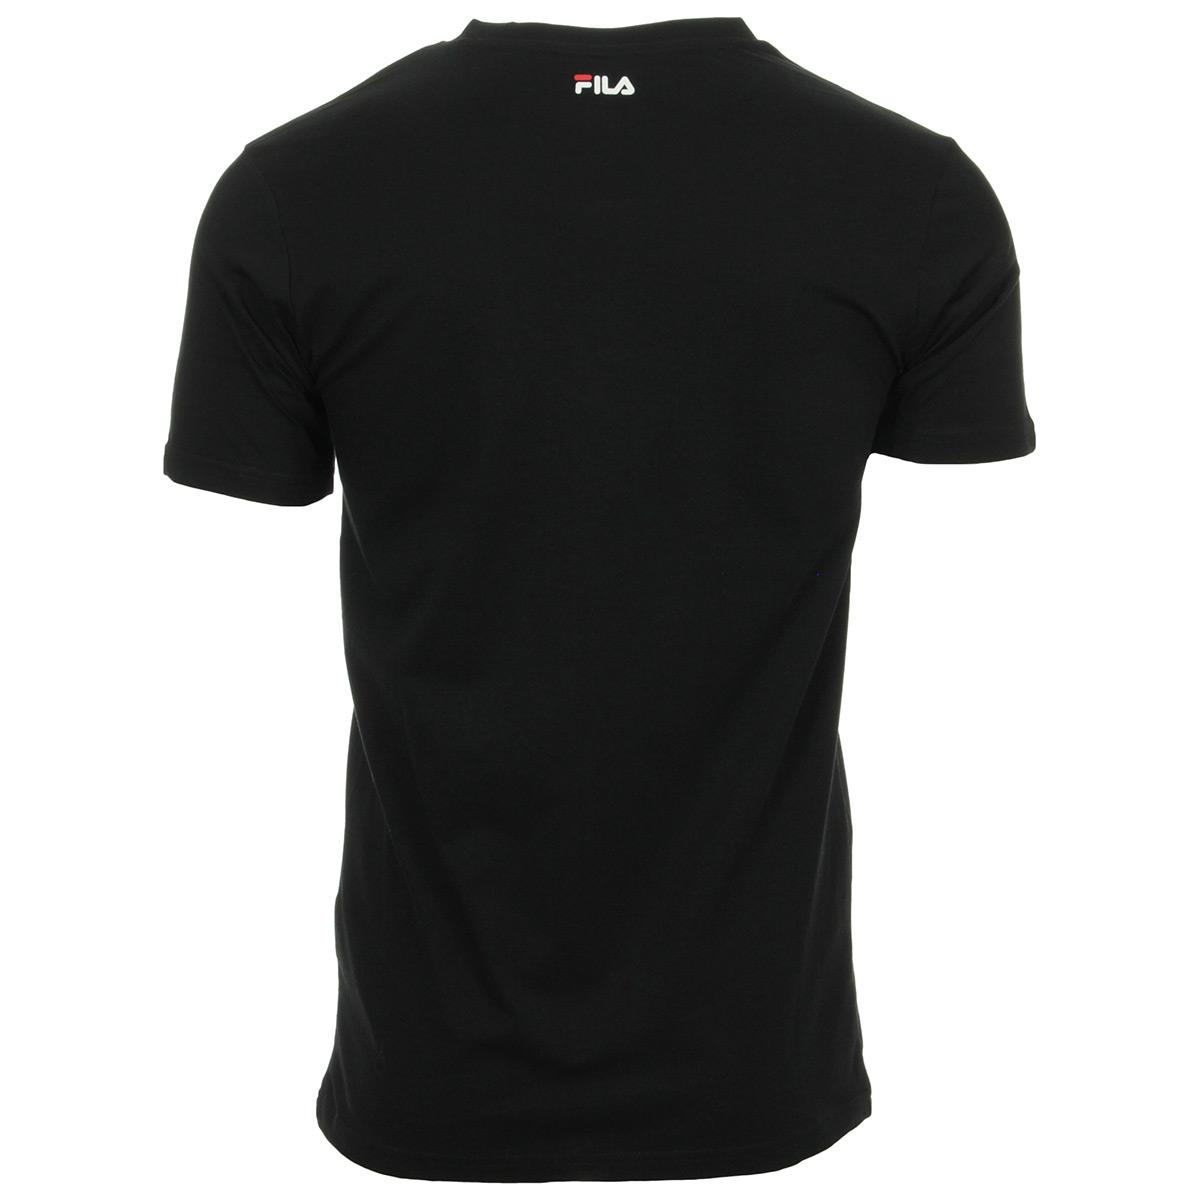 Fila Evan Tee SS 682157002, T-Shirts